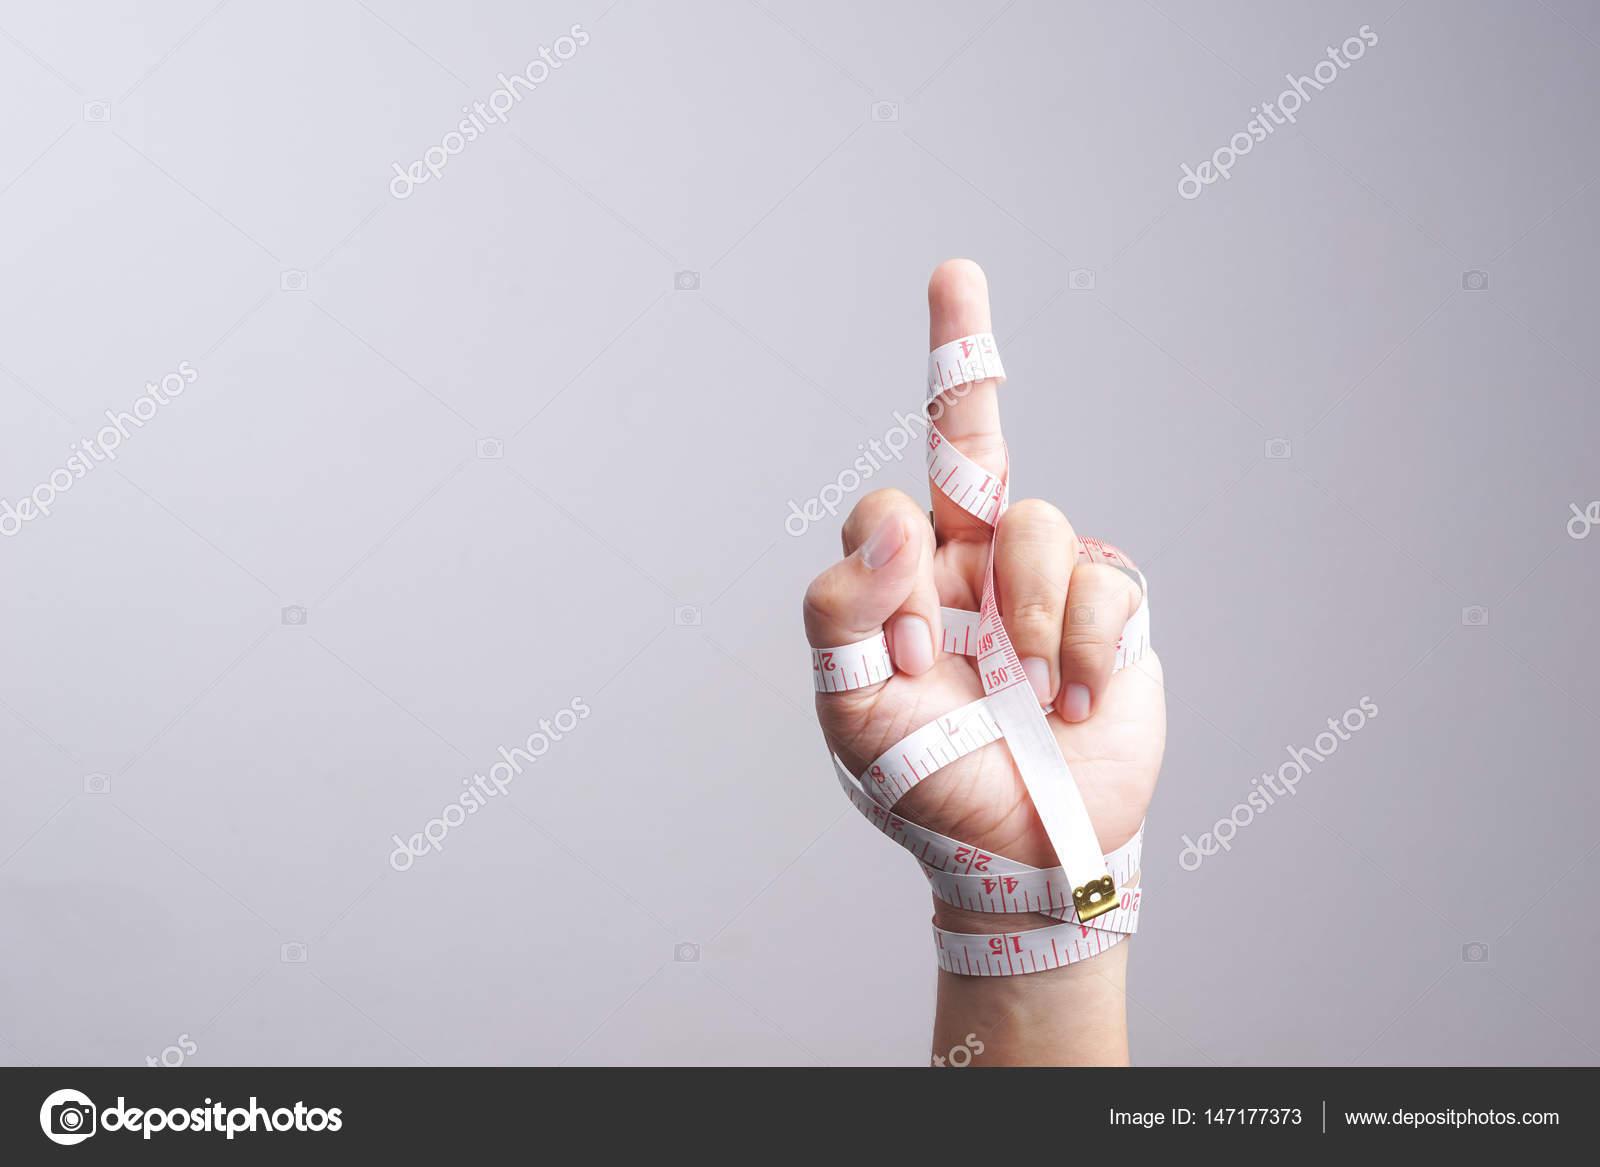 Son porn thumb fuck pics long photo gallery